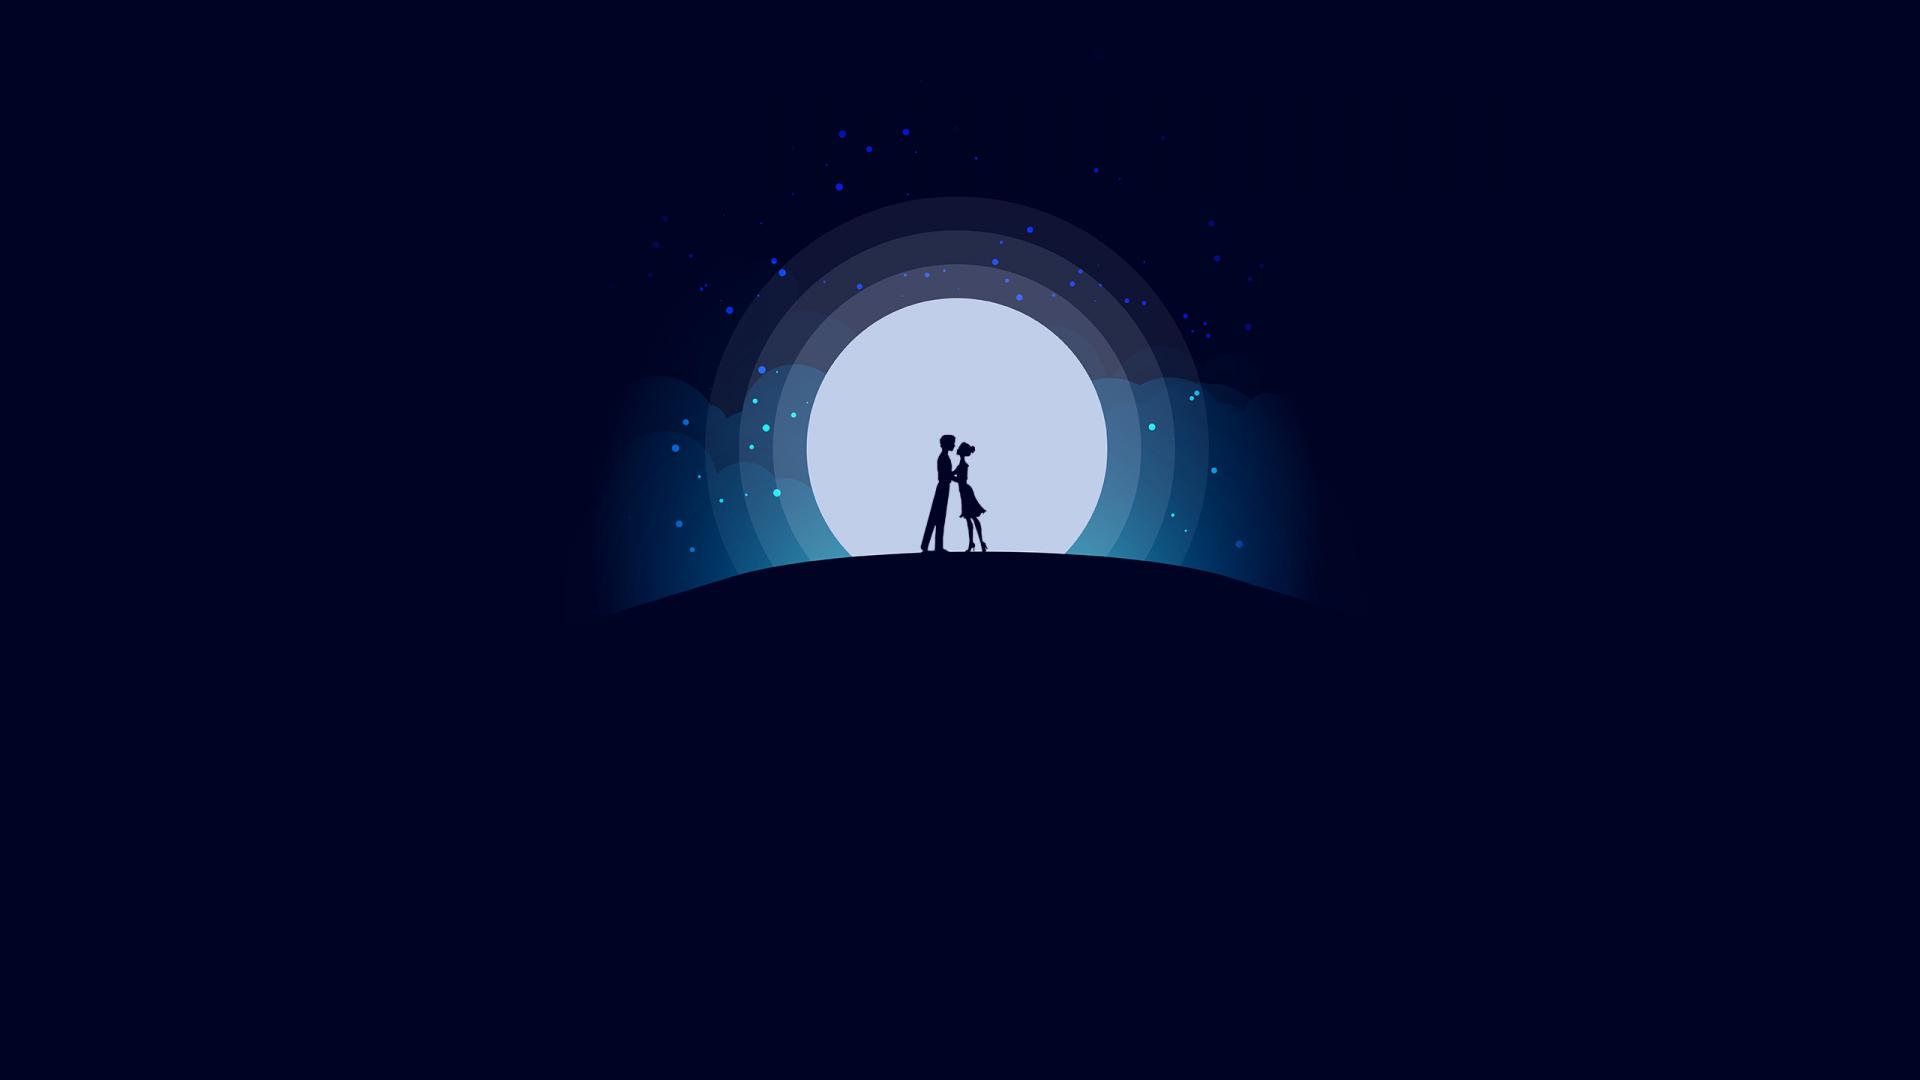 Download 1920x1080 Wallpaper Couple Love Moon Night Romantic